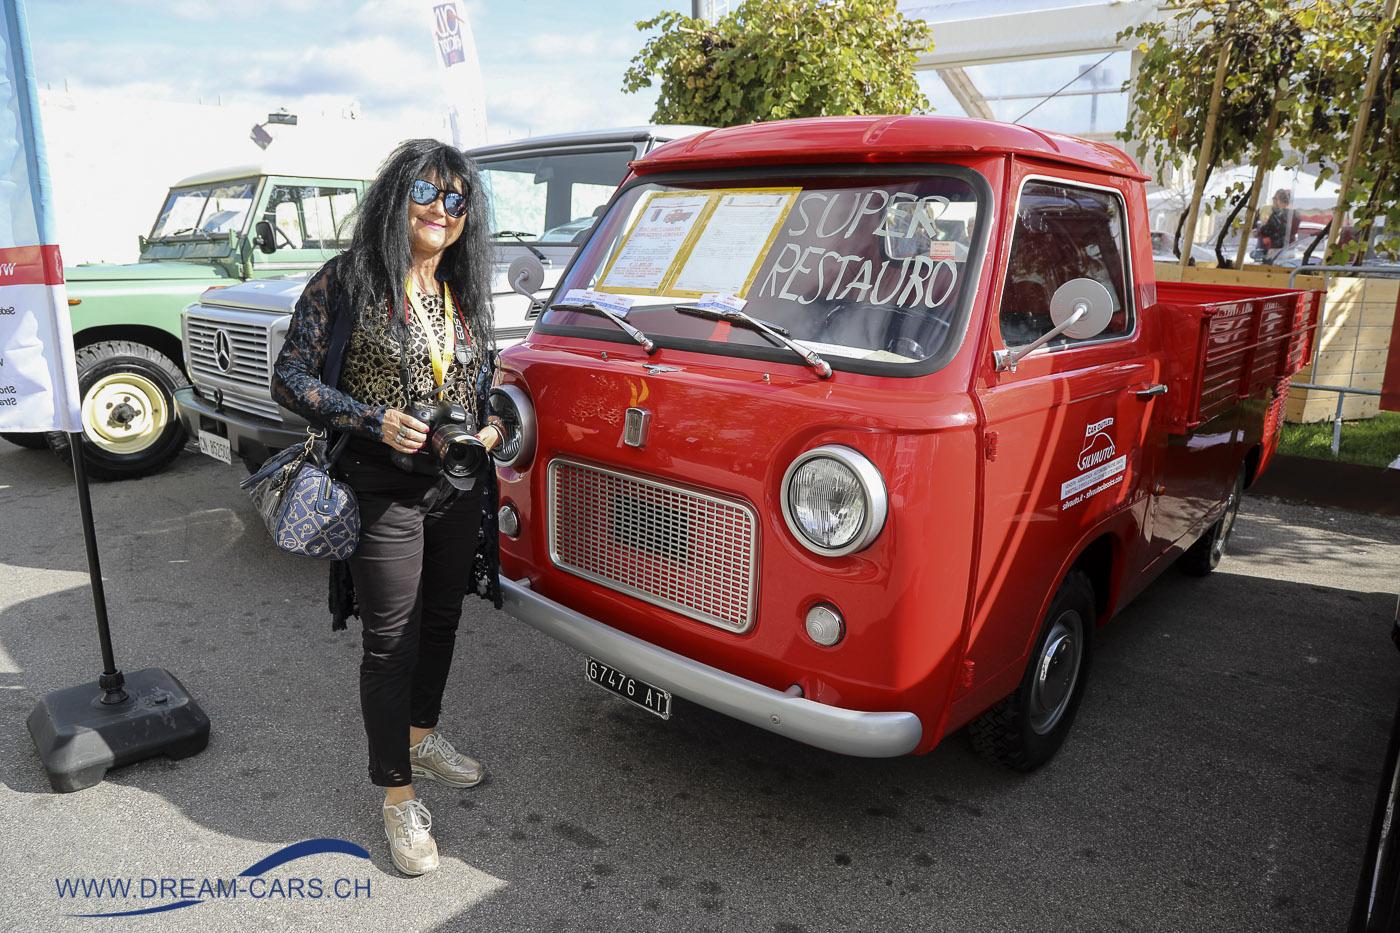 Auto e Moto d'Epoca Padua, 25. - 28. Oktober 2018. Ela Lehmann vor dem kleinen Fiat-Transporter